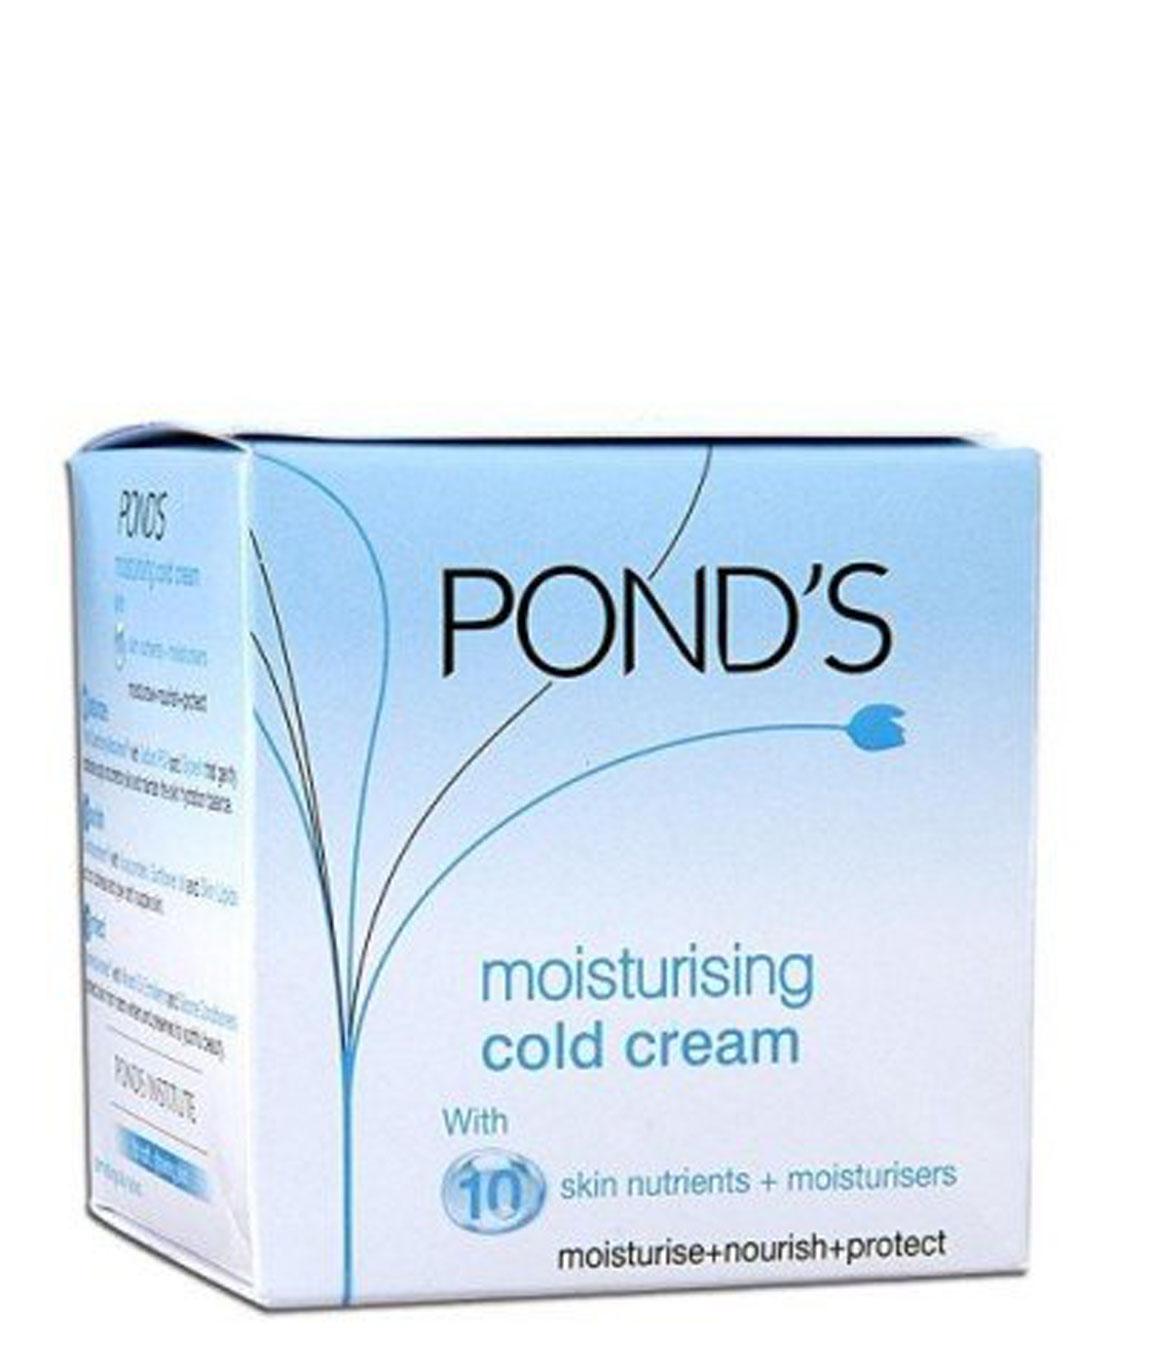 PONDS Moisturising Cold Cream (100ml) (Pack of 2)